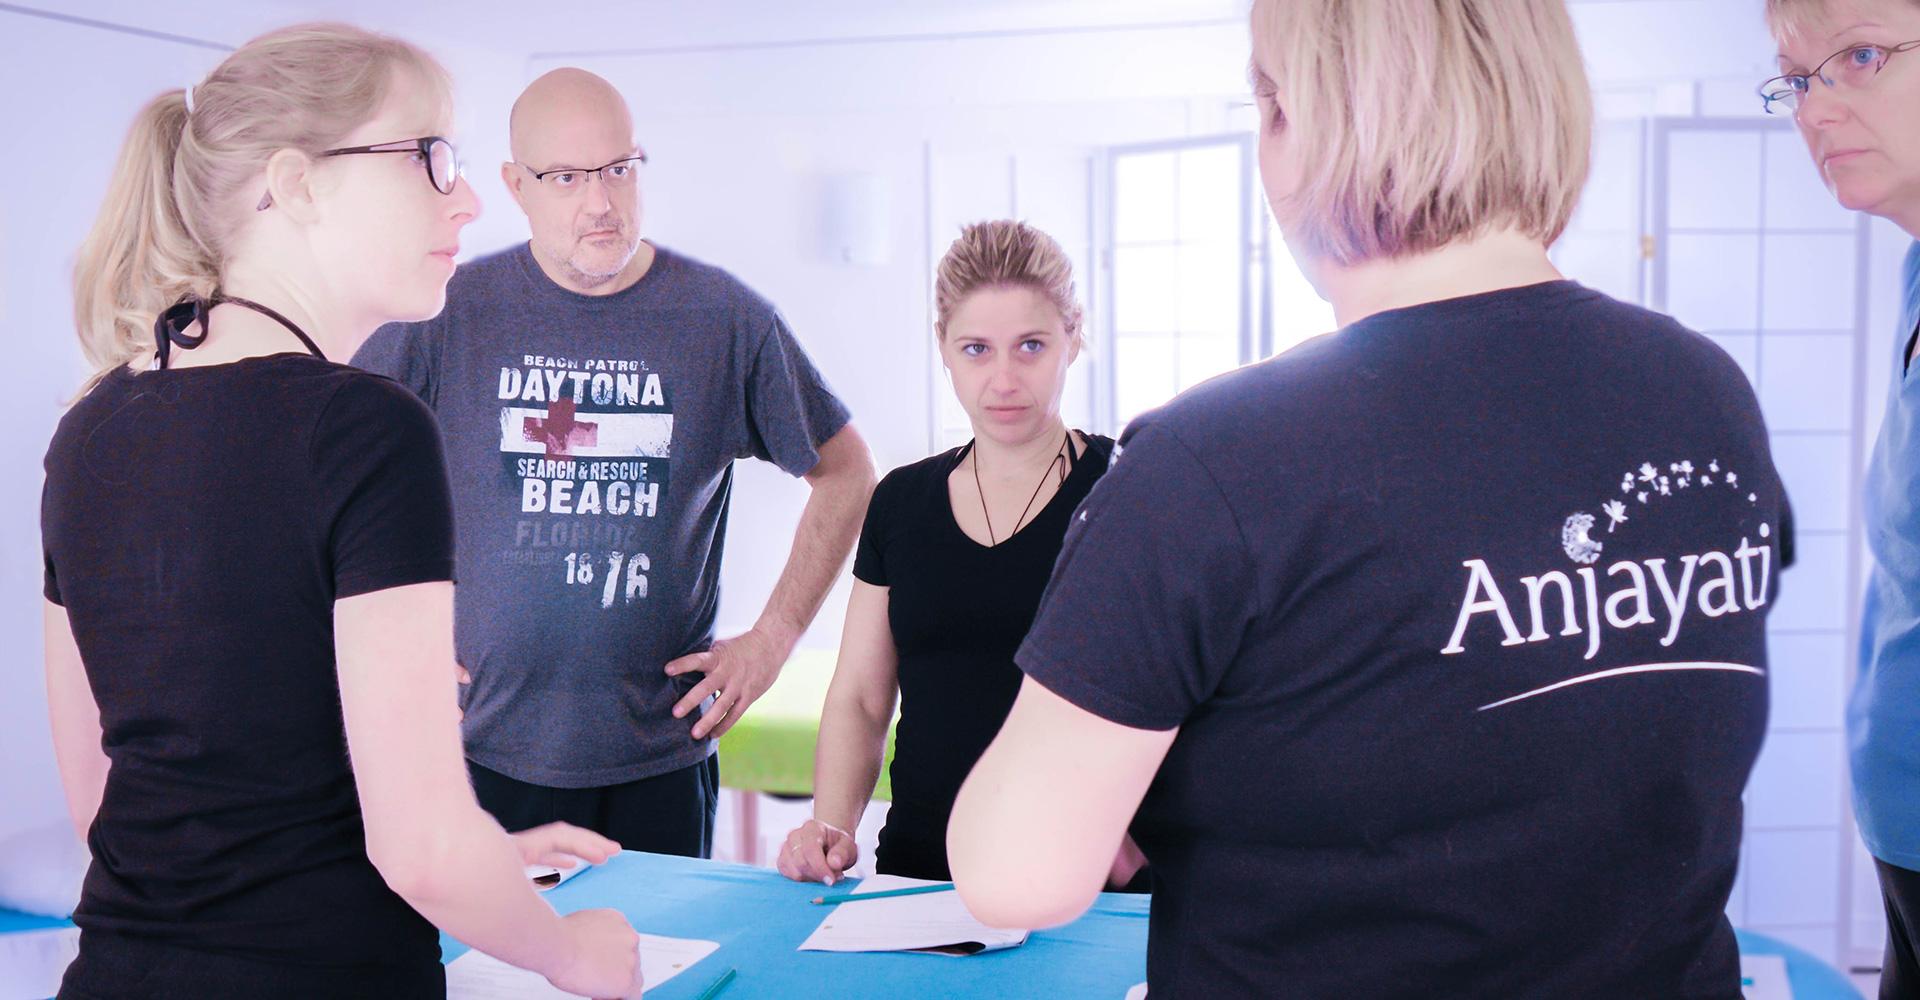 formation-anatomie-adaptee-au-massage-bien-etre-anjayati